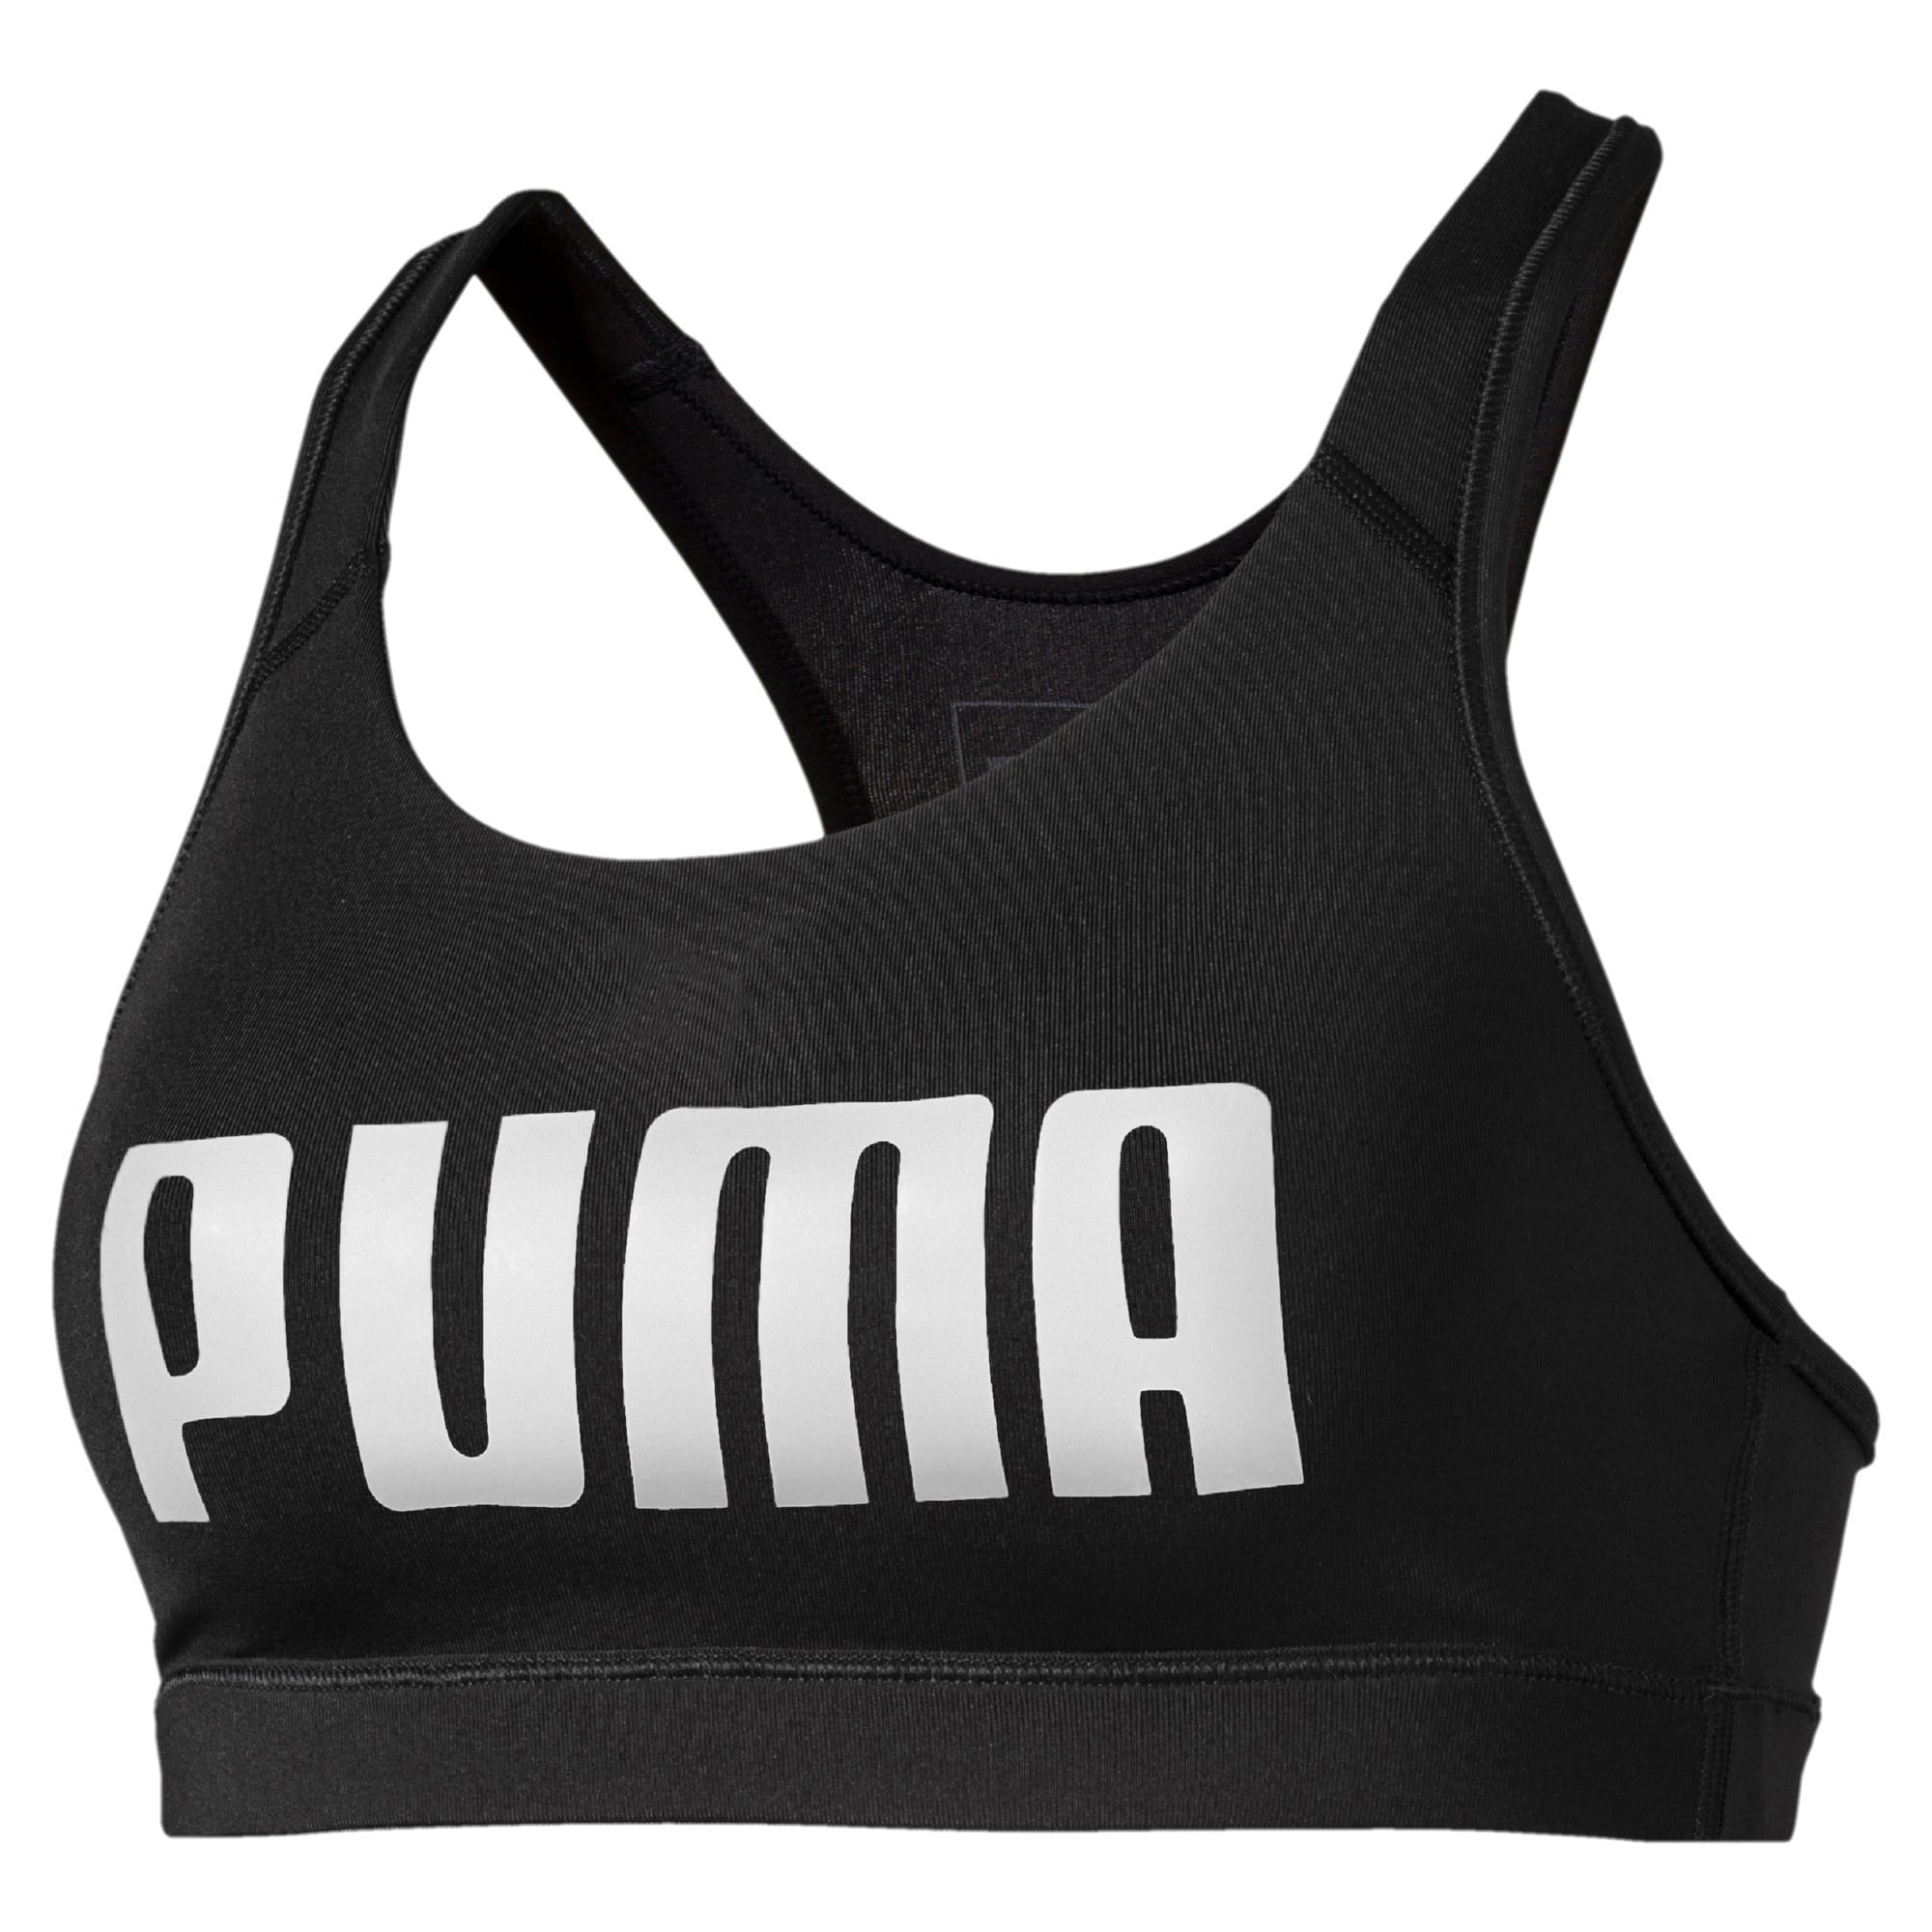 Thumbnail 4 of 4Keeps Mid Impact Women's Bra Top, Puma Black-Puma White, medium